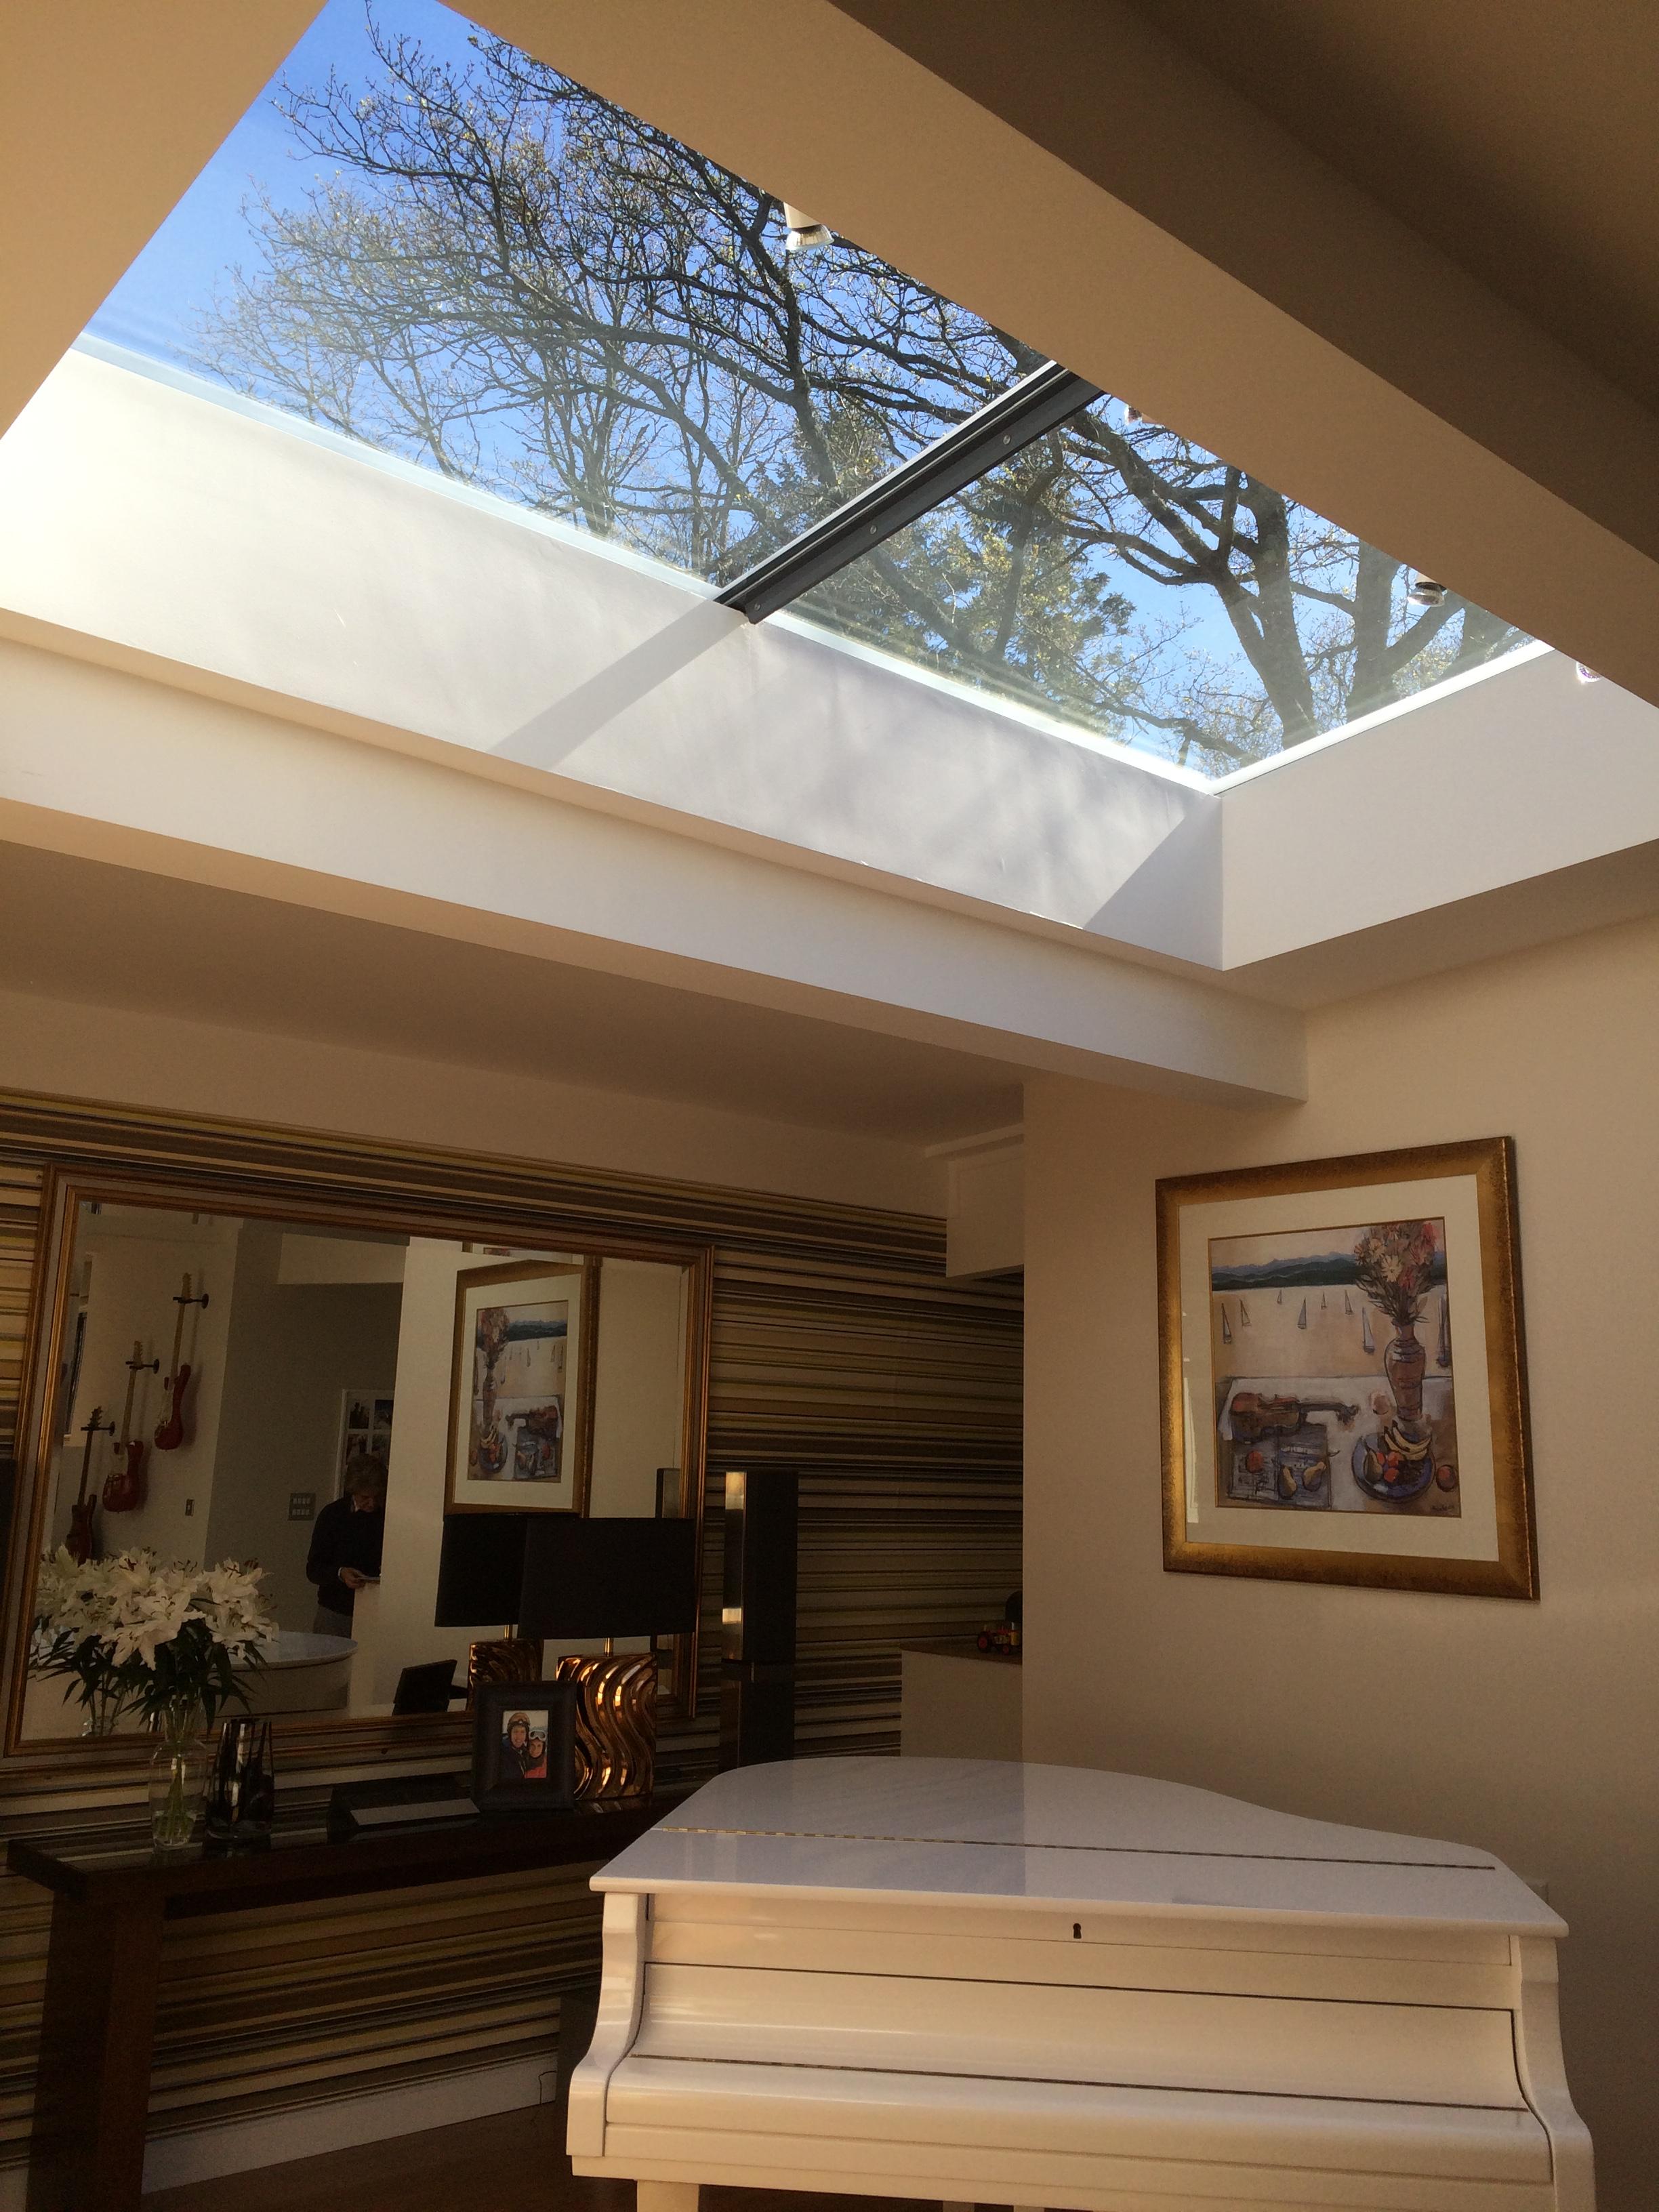 Roofglaze Ltd